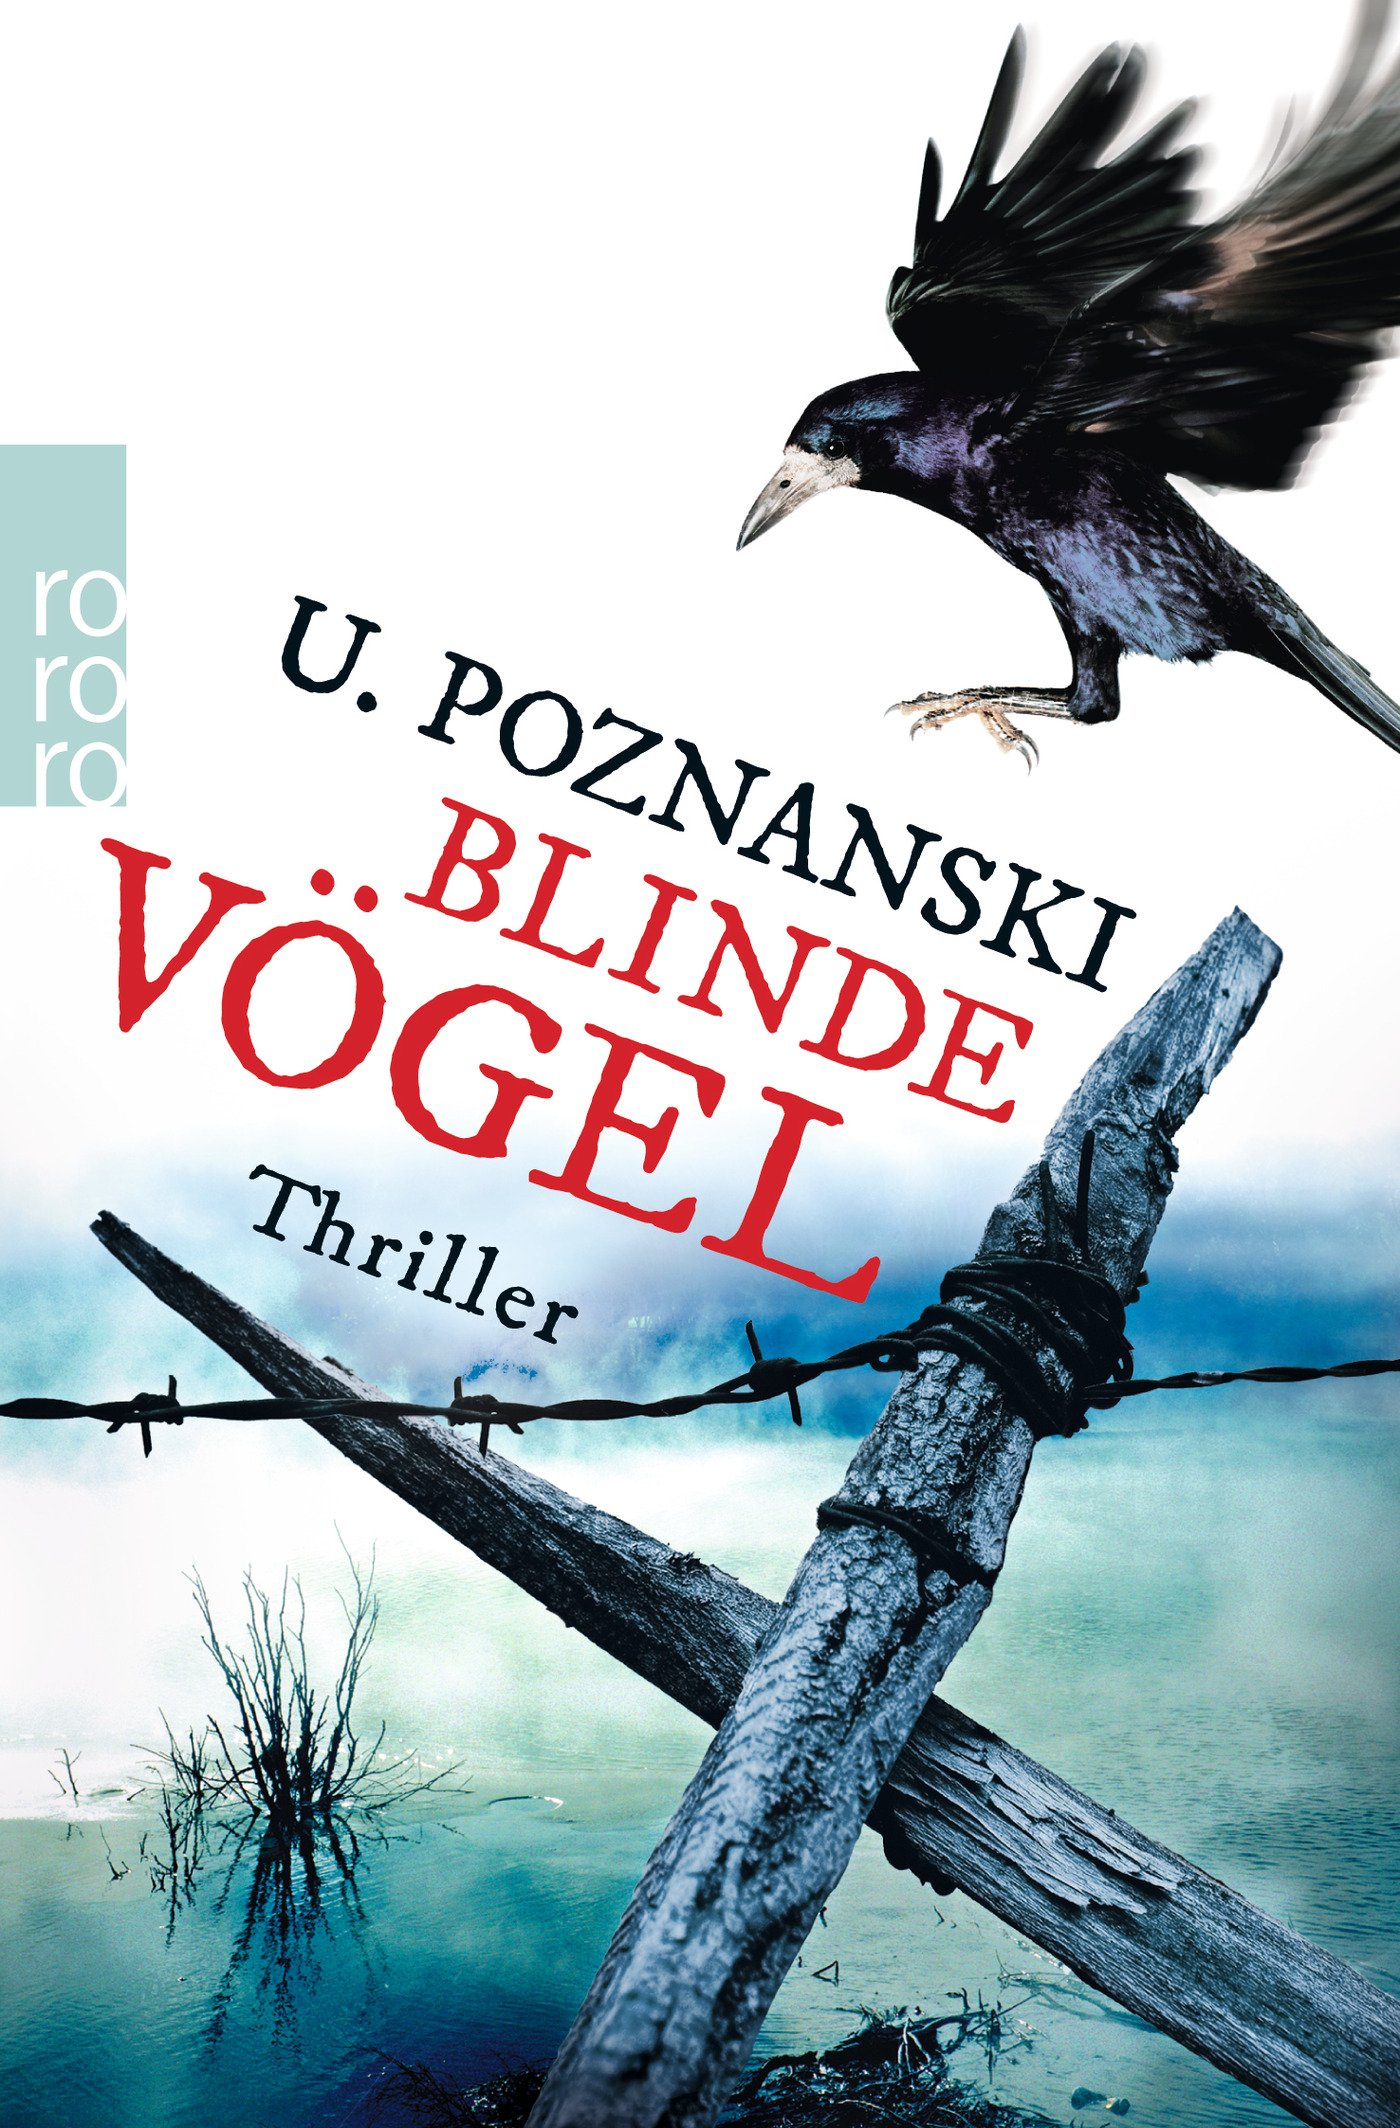 Blinde Vögel (Kaspary & Wenninger ermitteln, Band 2) Taschenbuch – 30. Januar 2015 Ursula Poznanski Rowohlt Taschenbuch 349925980X Belletristik / Kriminalromane